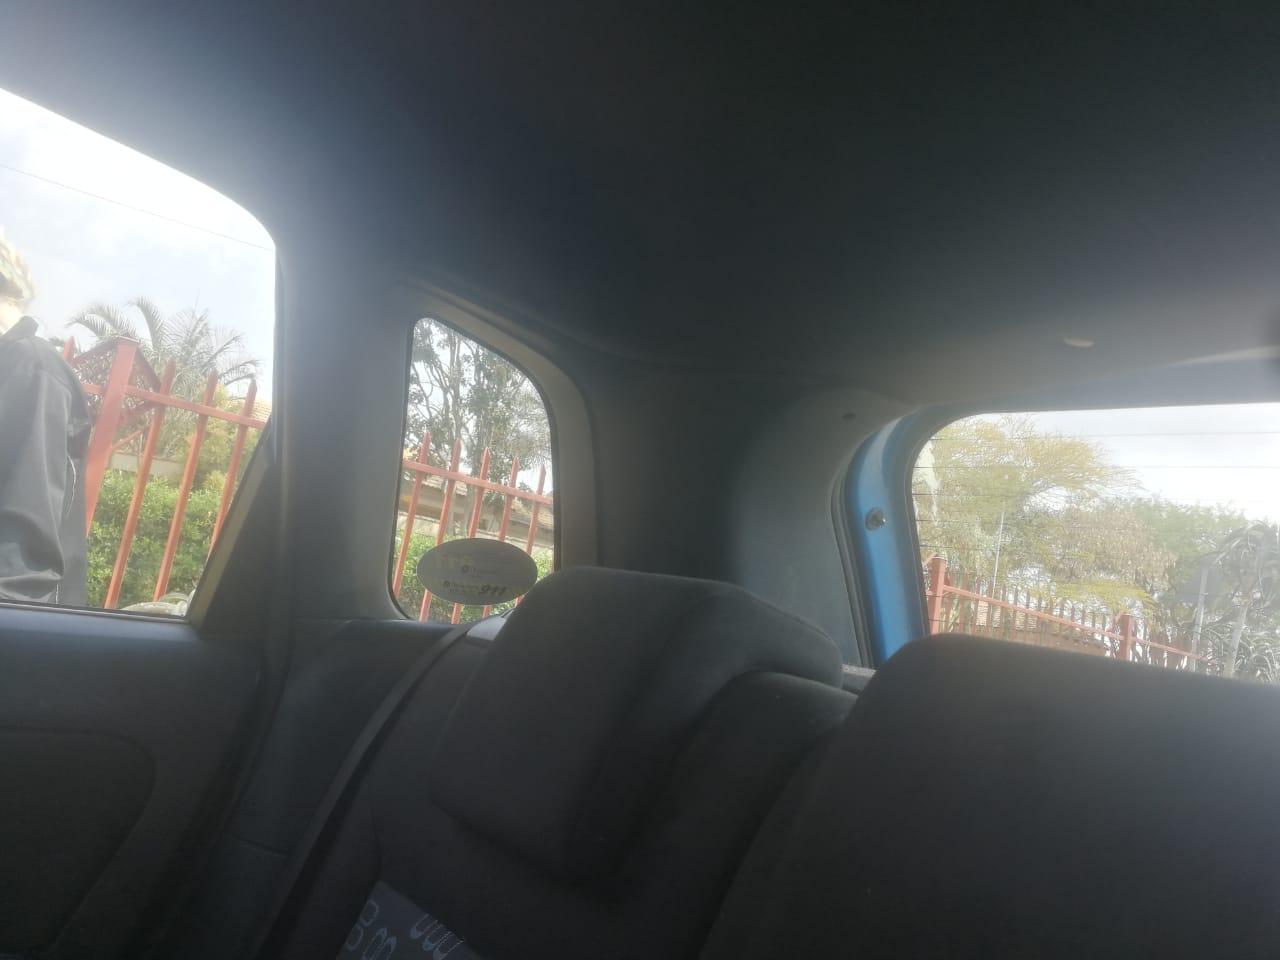 2006 Ford Fiesta 1.6 5 door Ambiente